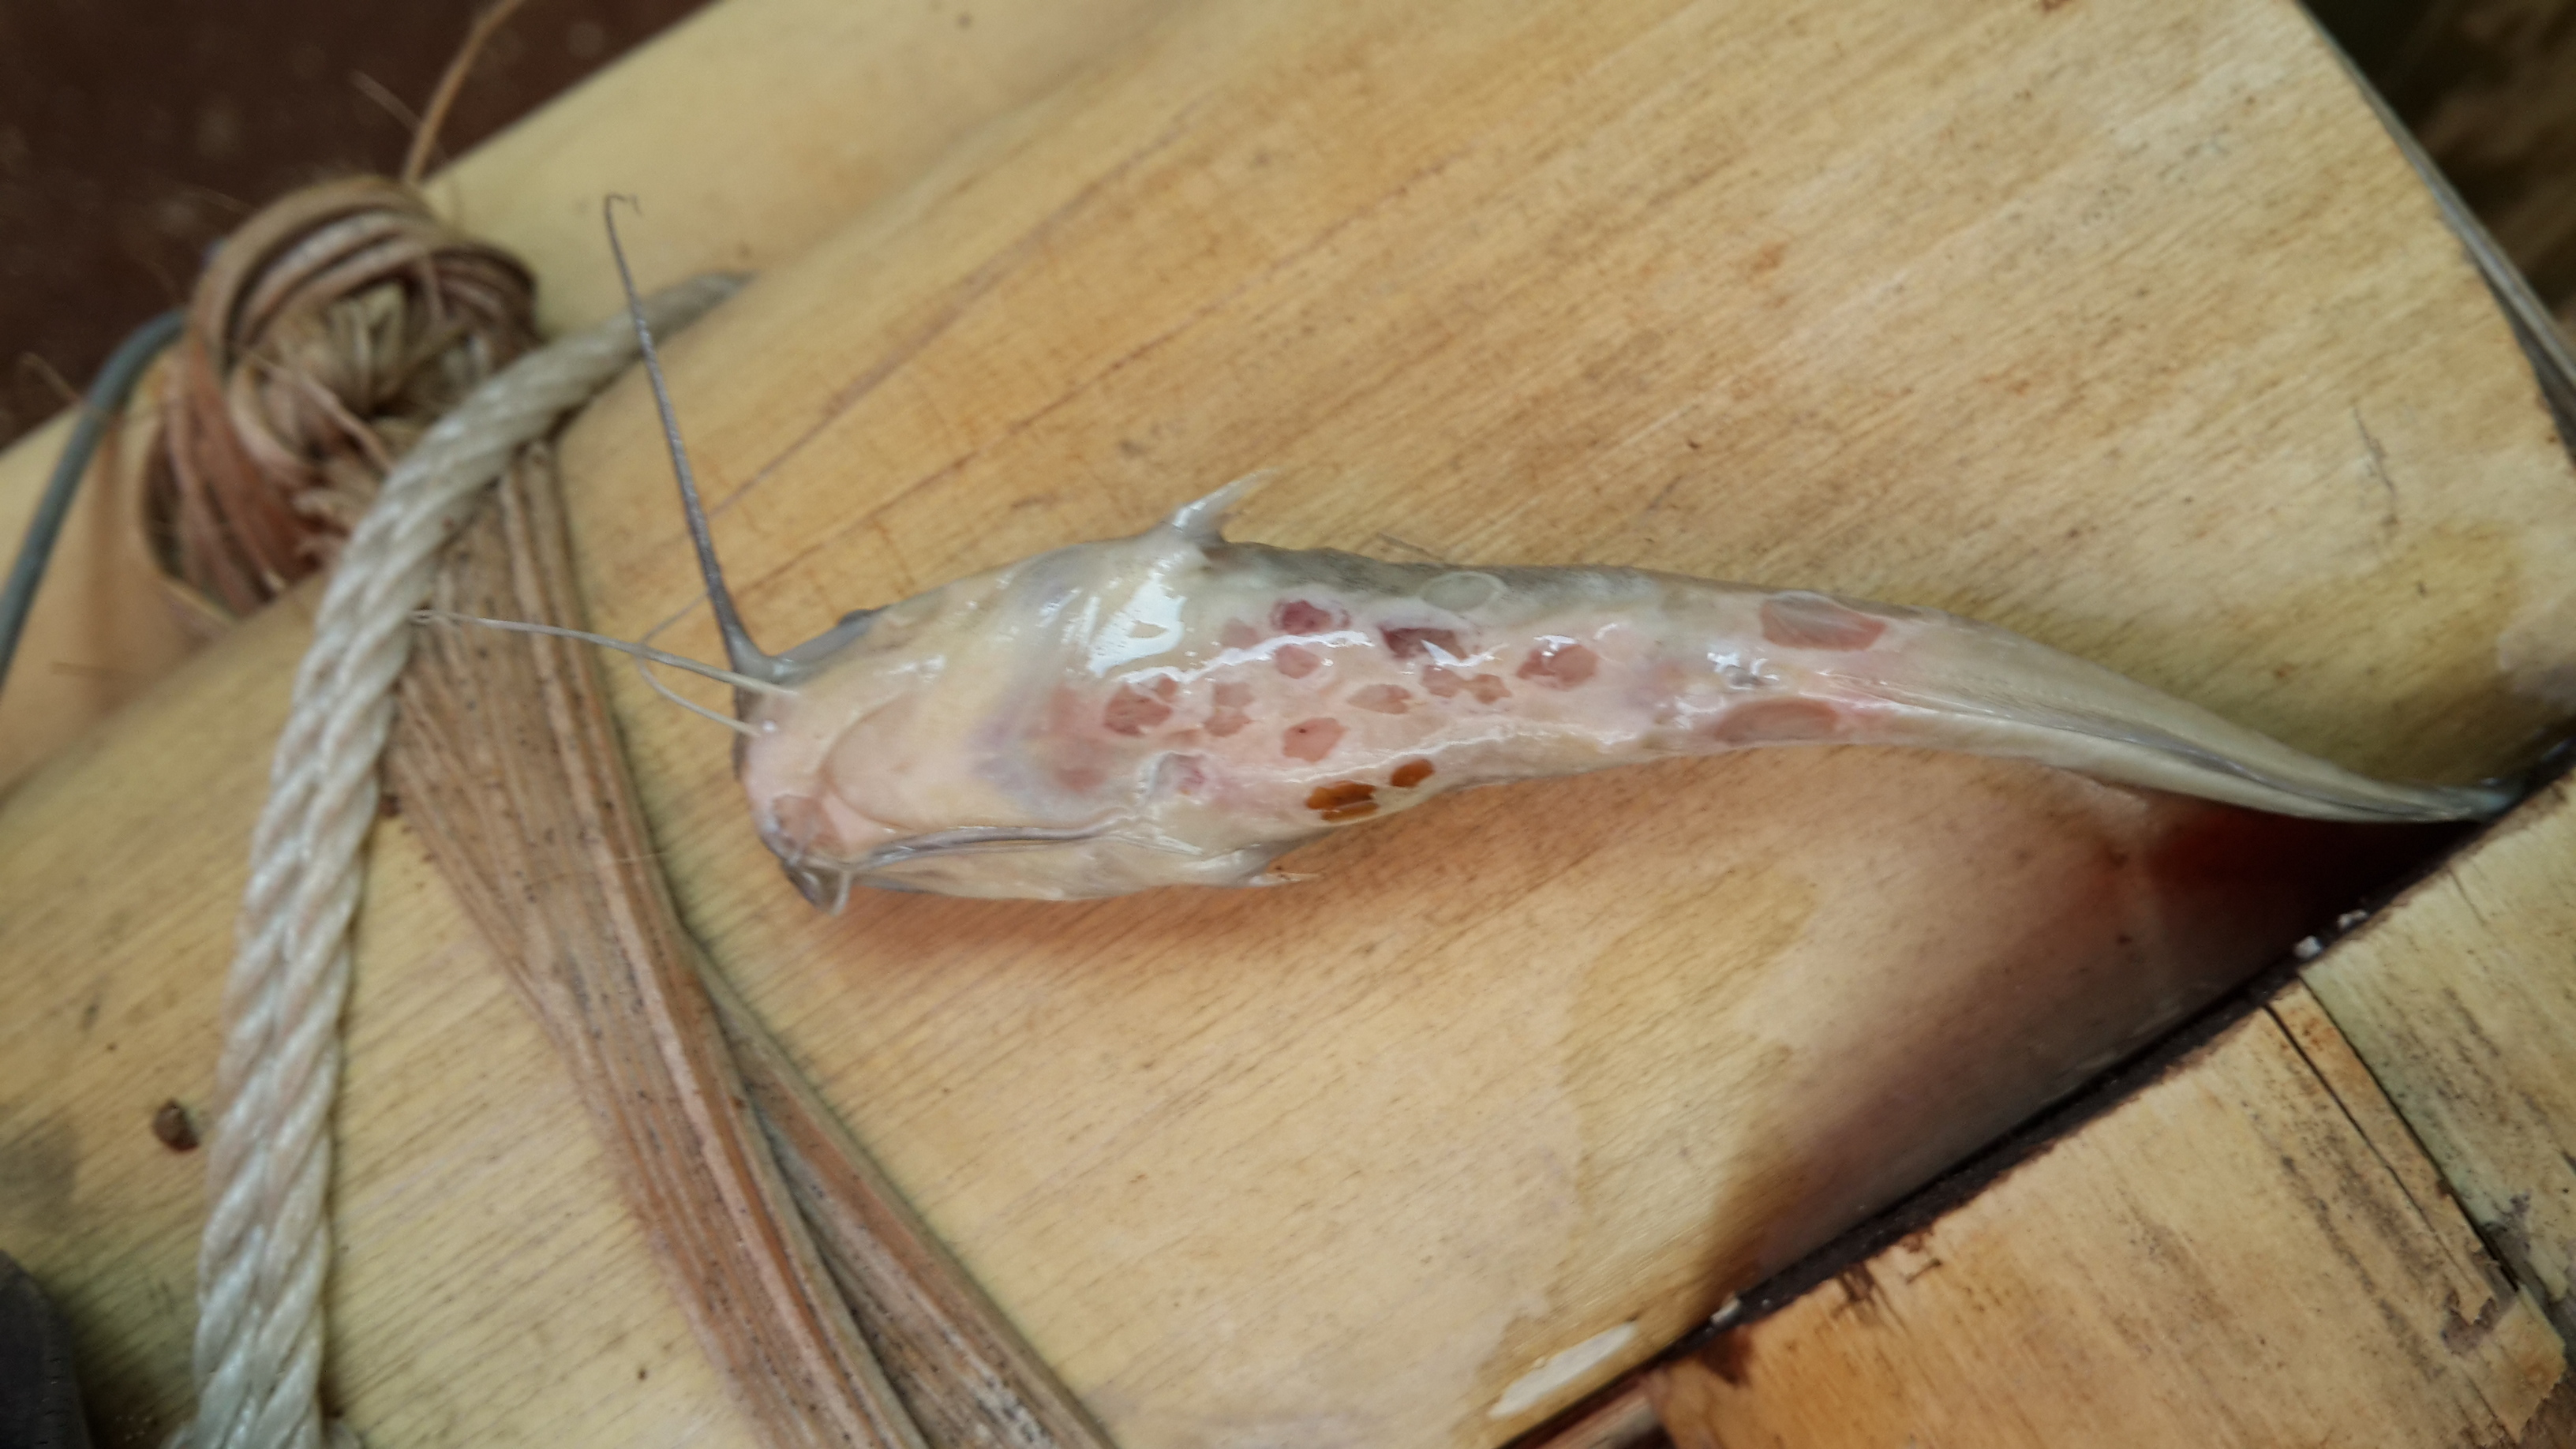 Mengatasi Jamur Pada Lele Sangkuriang